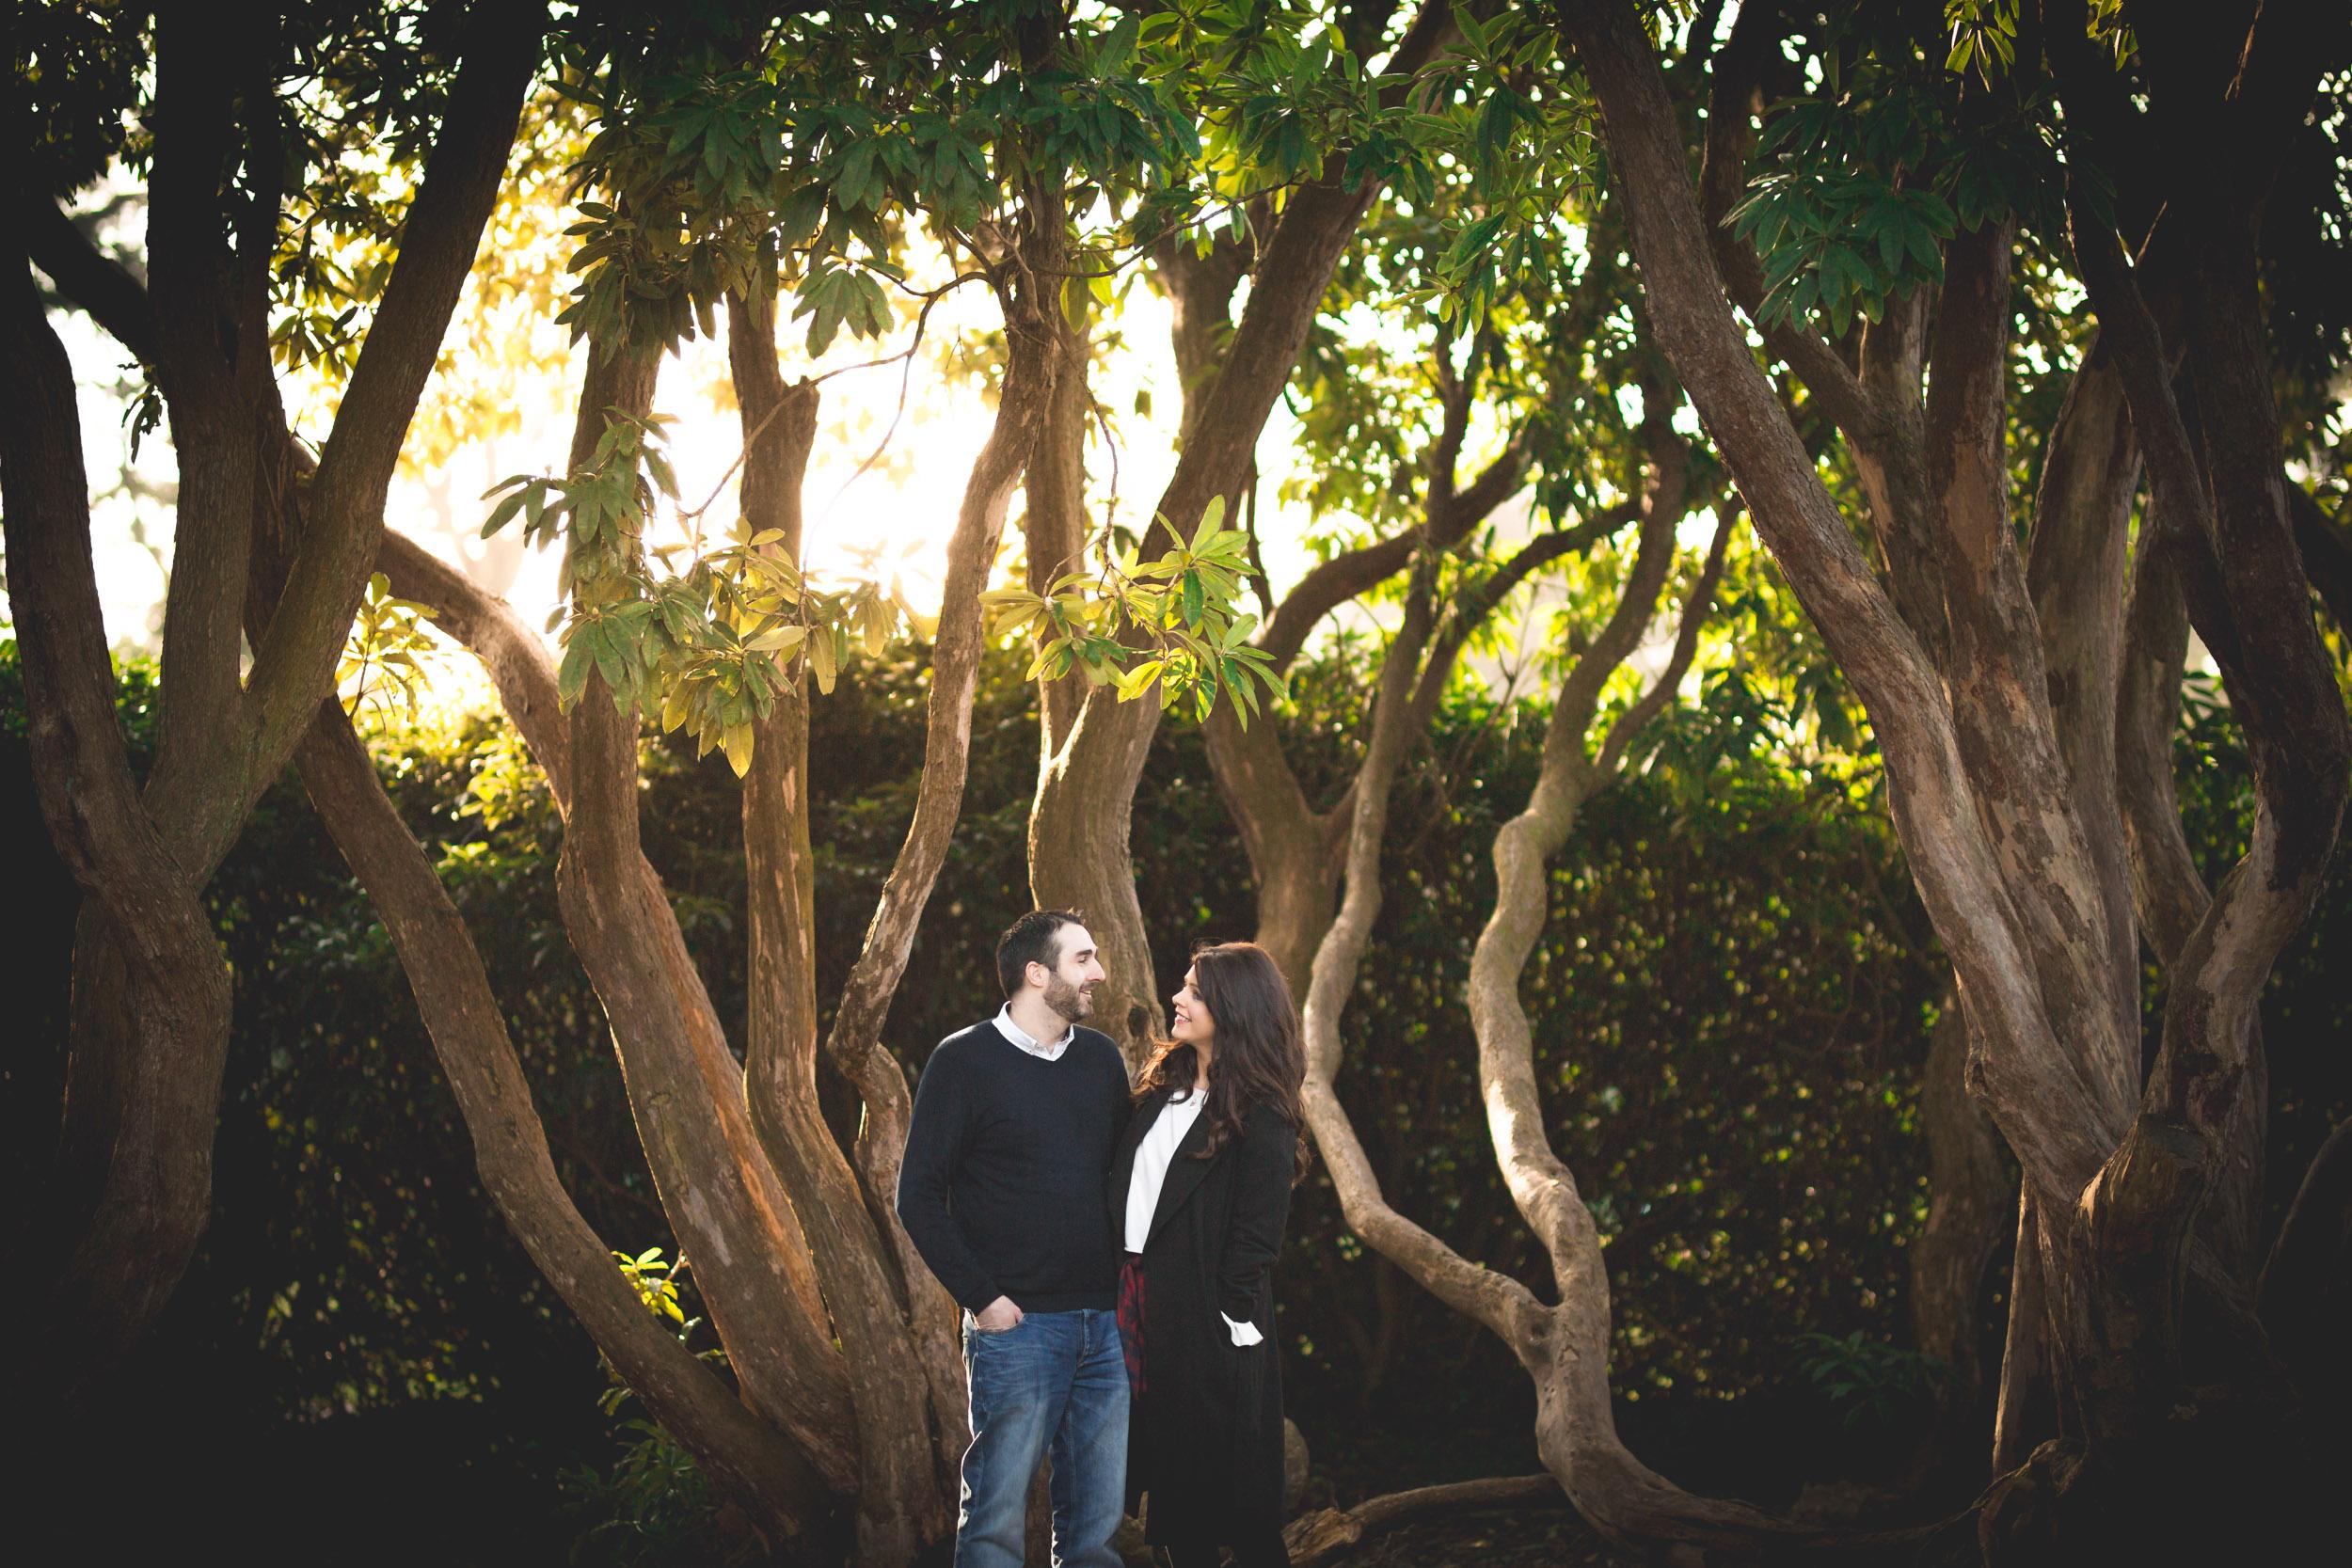 Oonagh & Francis Engagement-21.jpg